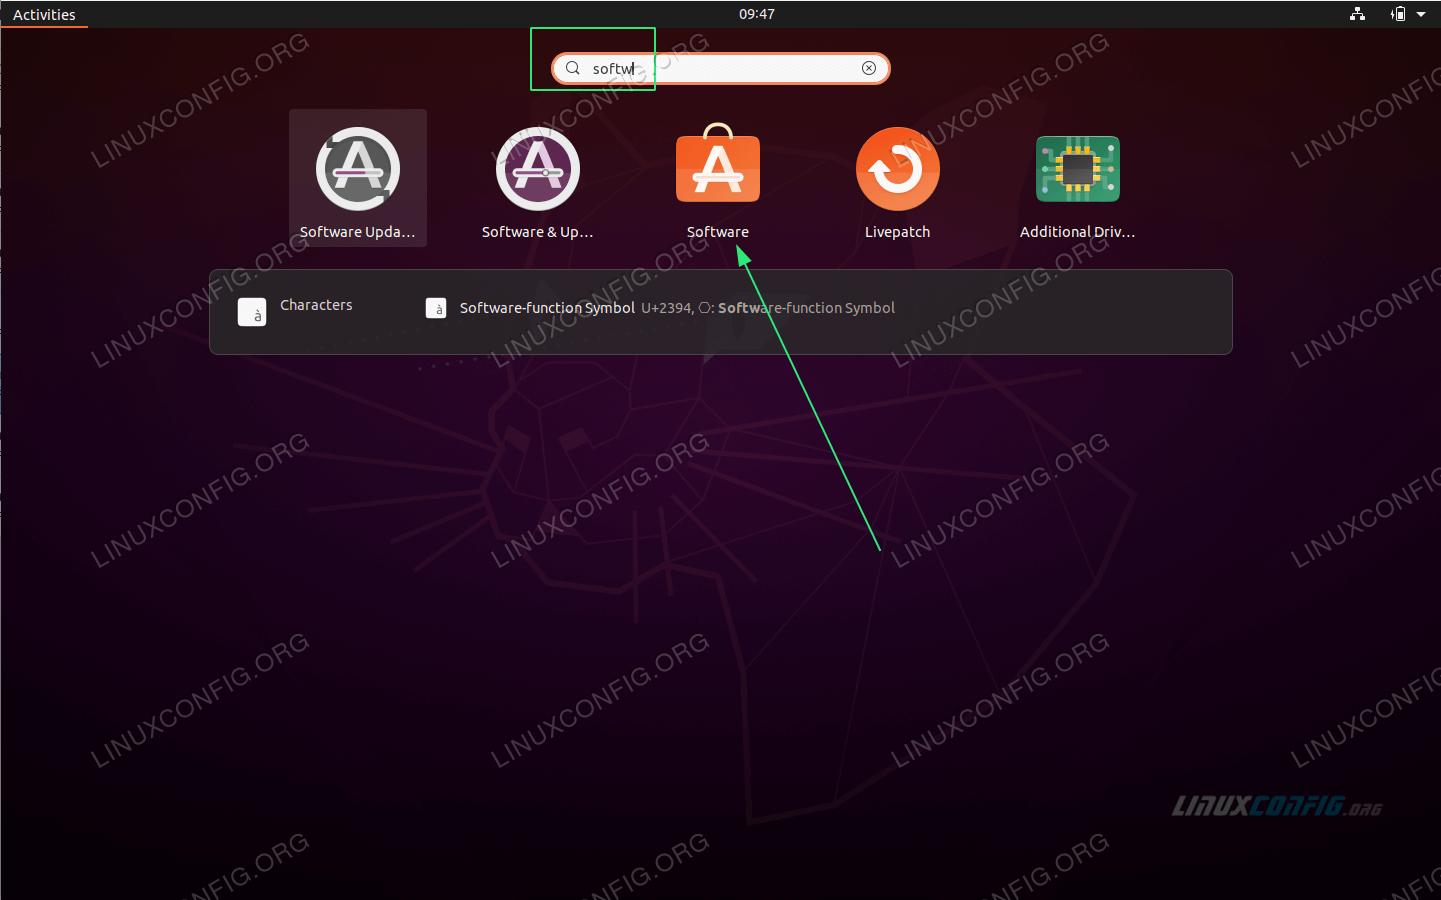 Open software application